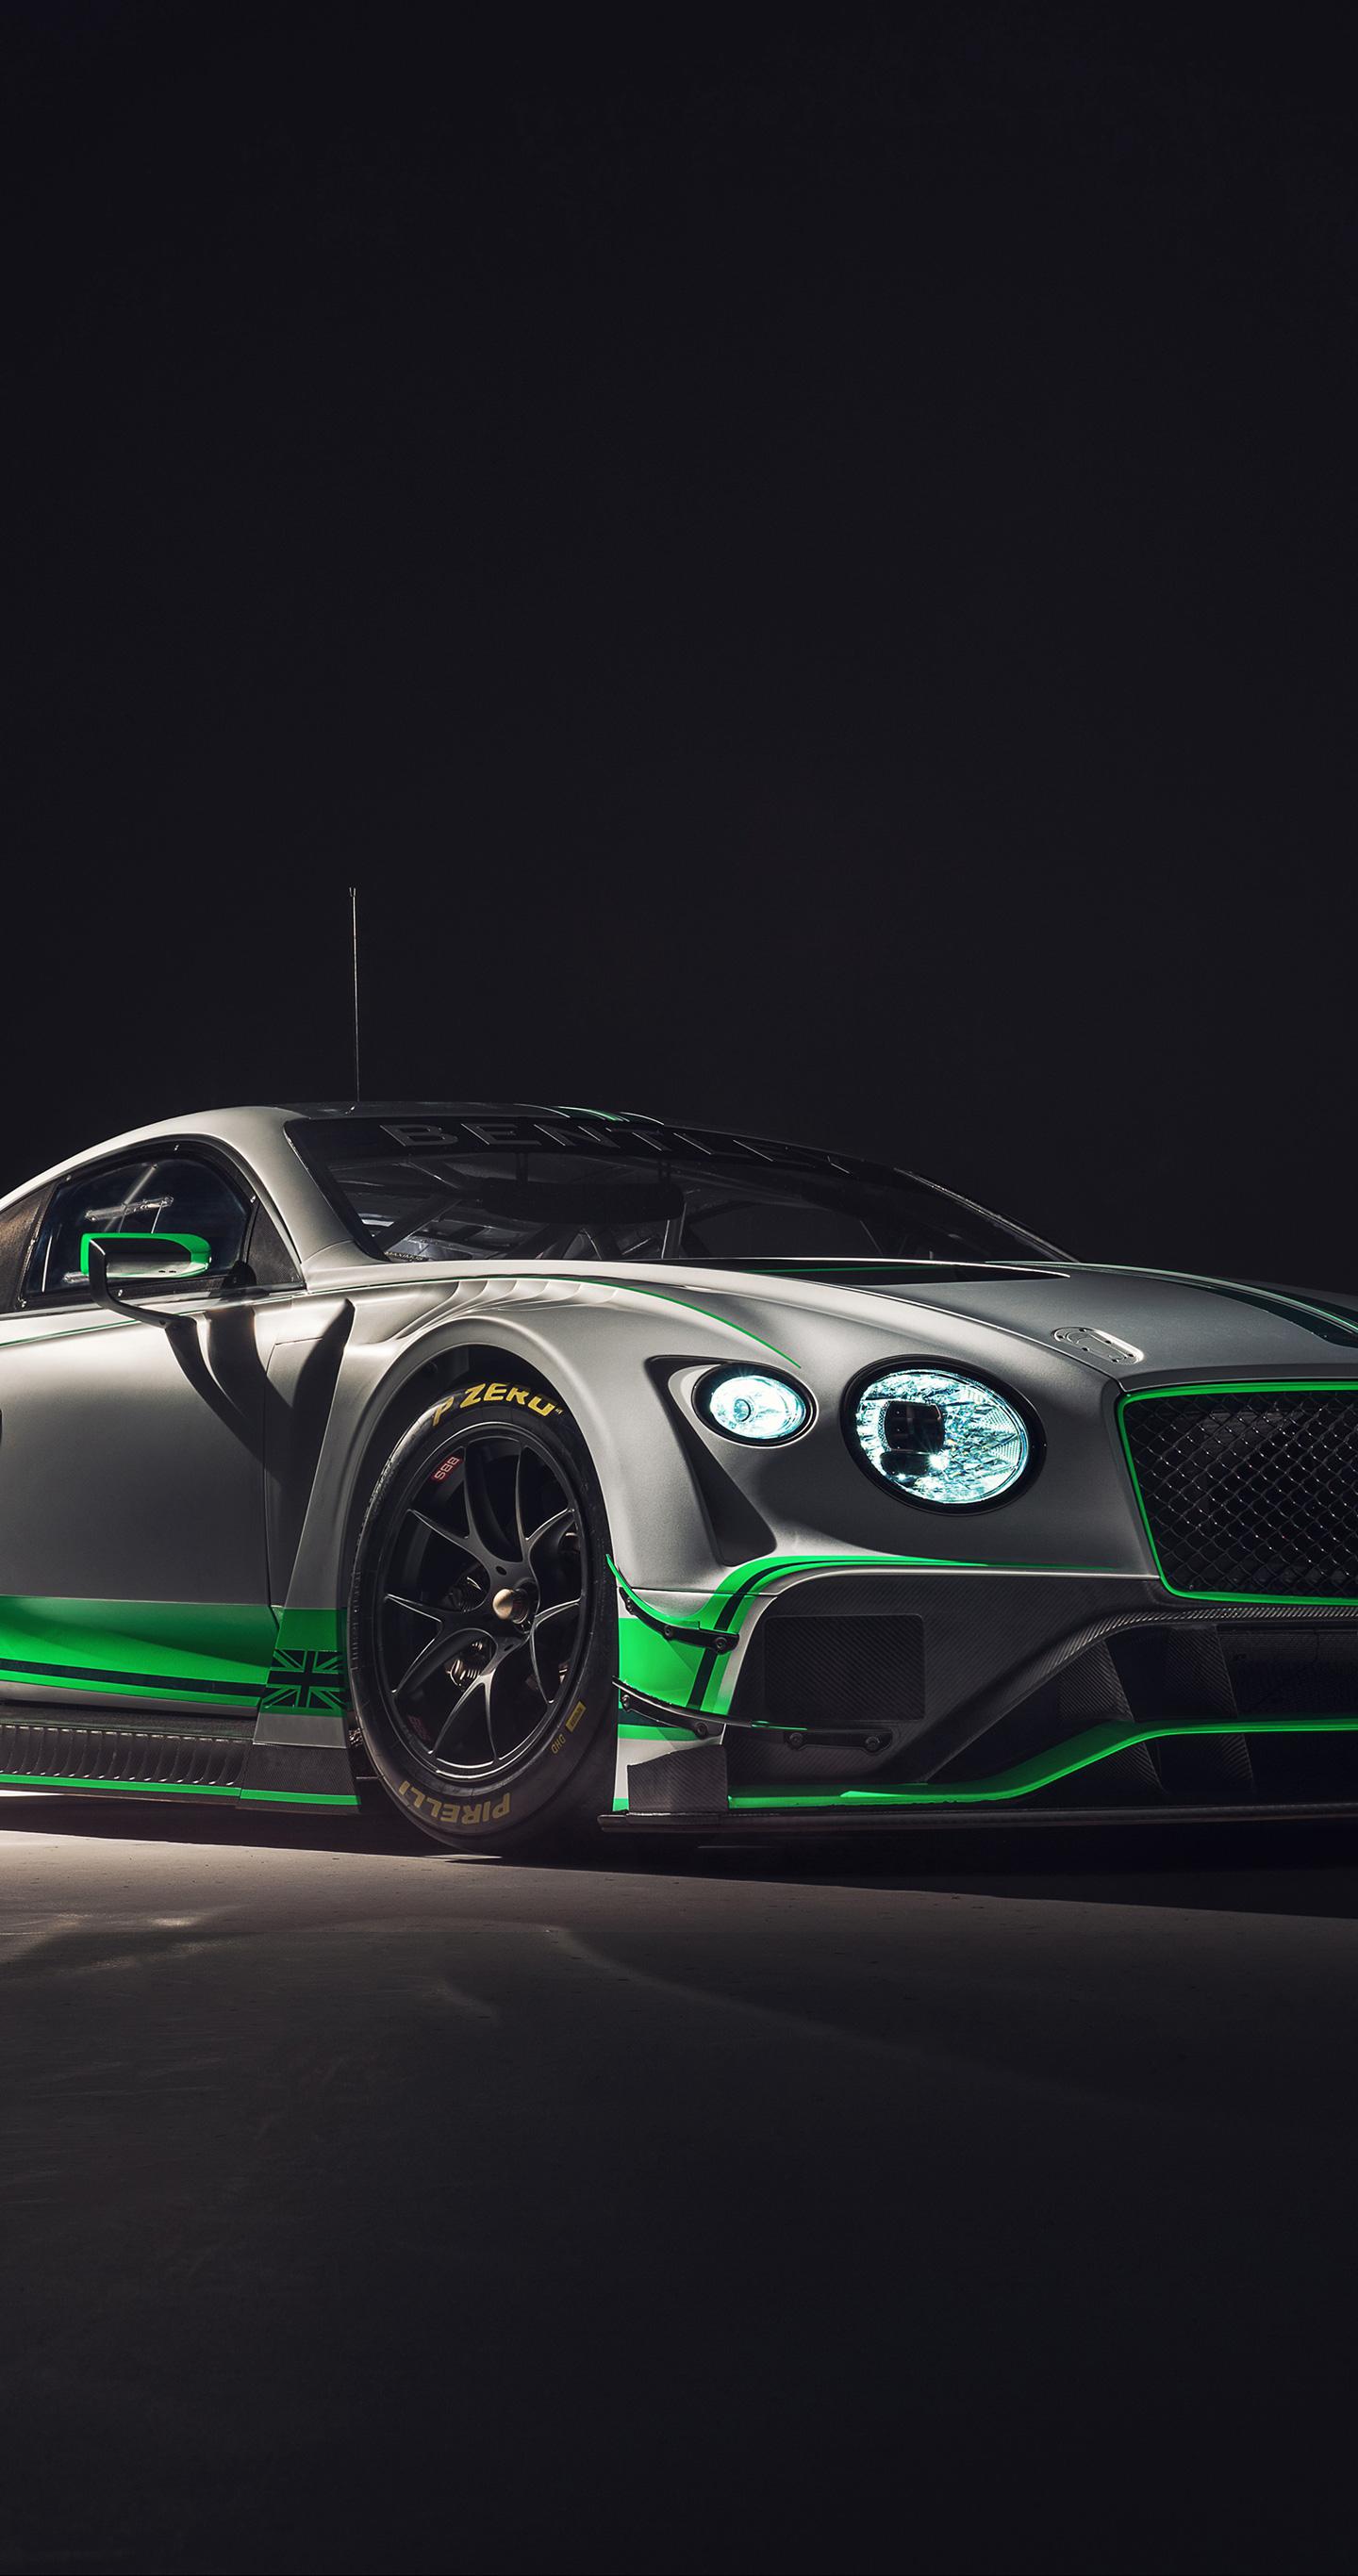 2018 Bentley Continental GT3, 2018 luxury car, 1440x2880 wallpaper